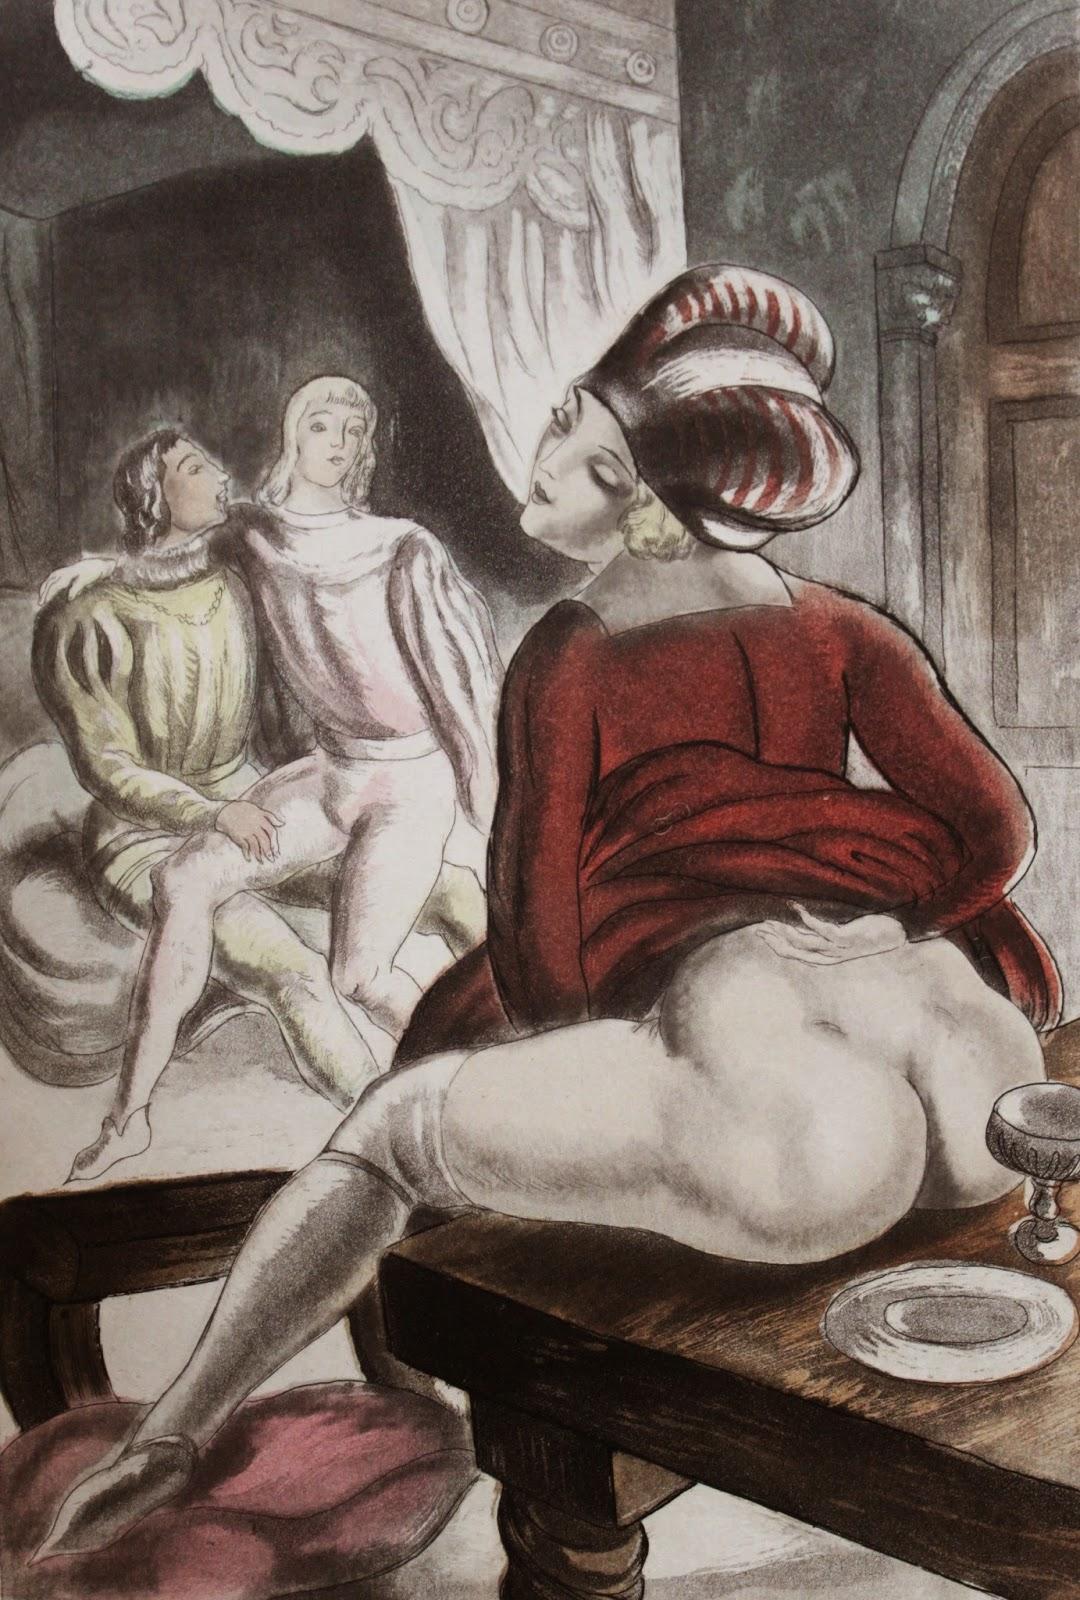 Erotic victoriana drawings photos illustrations